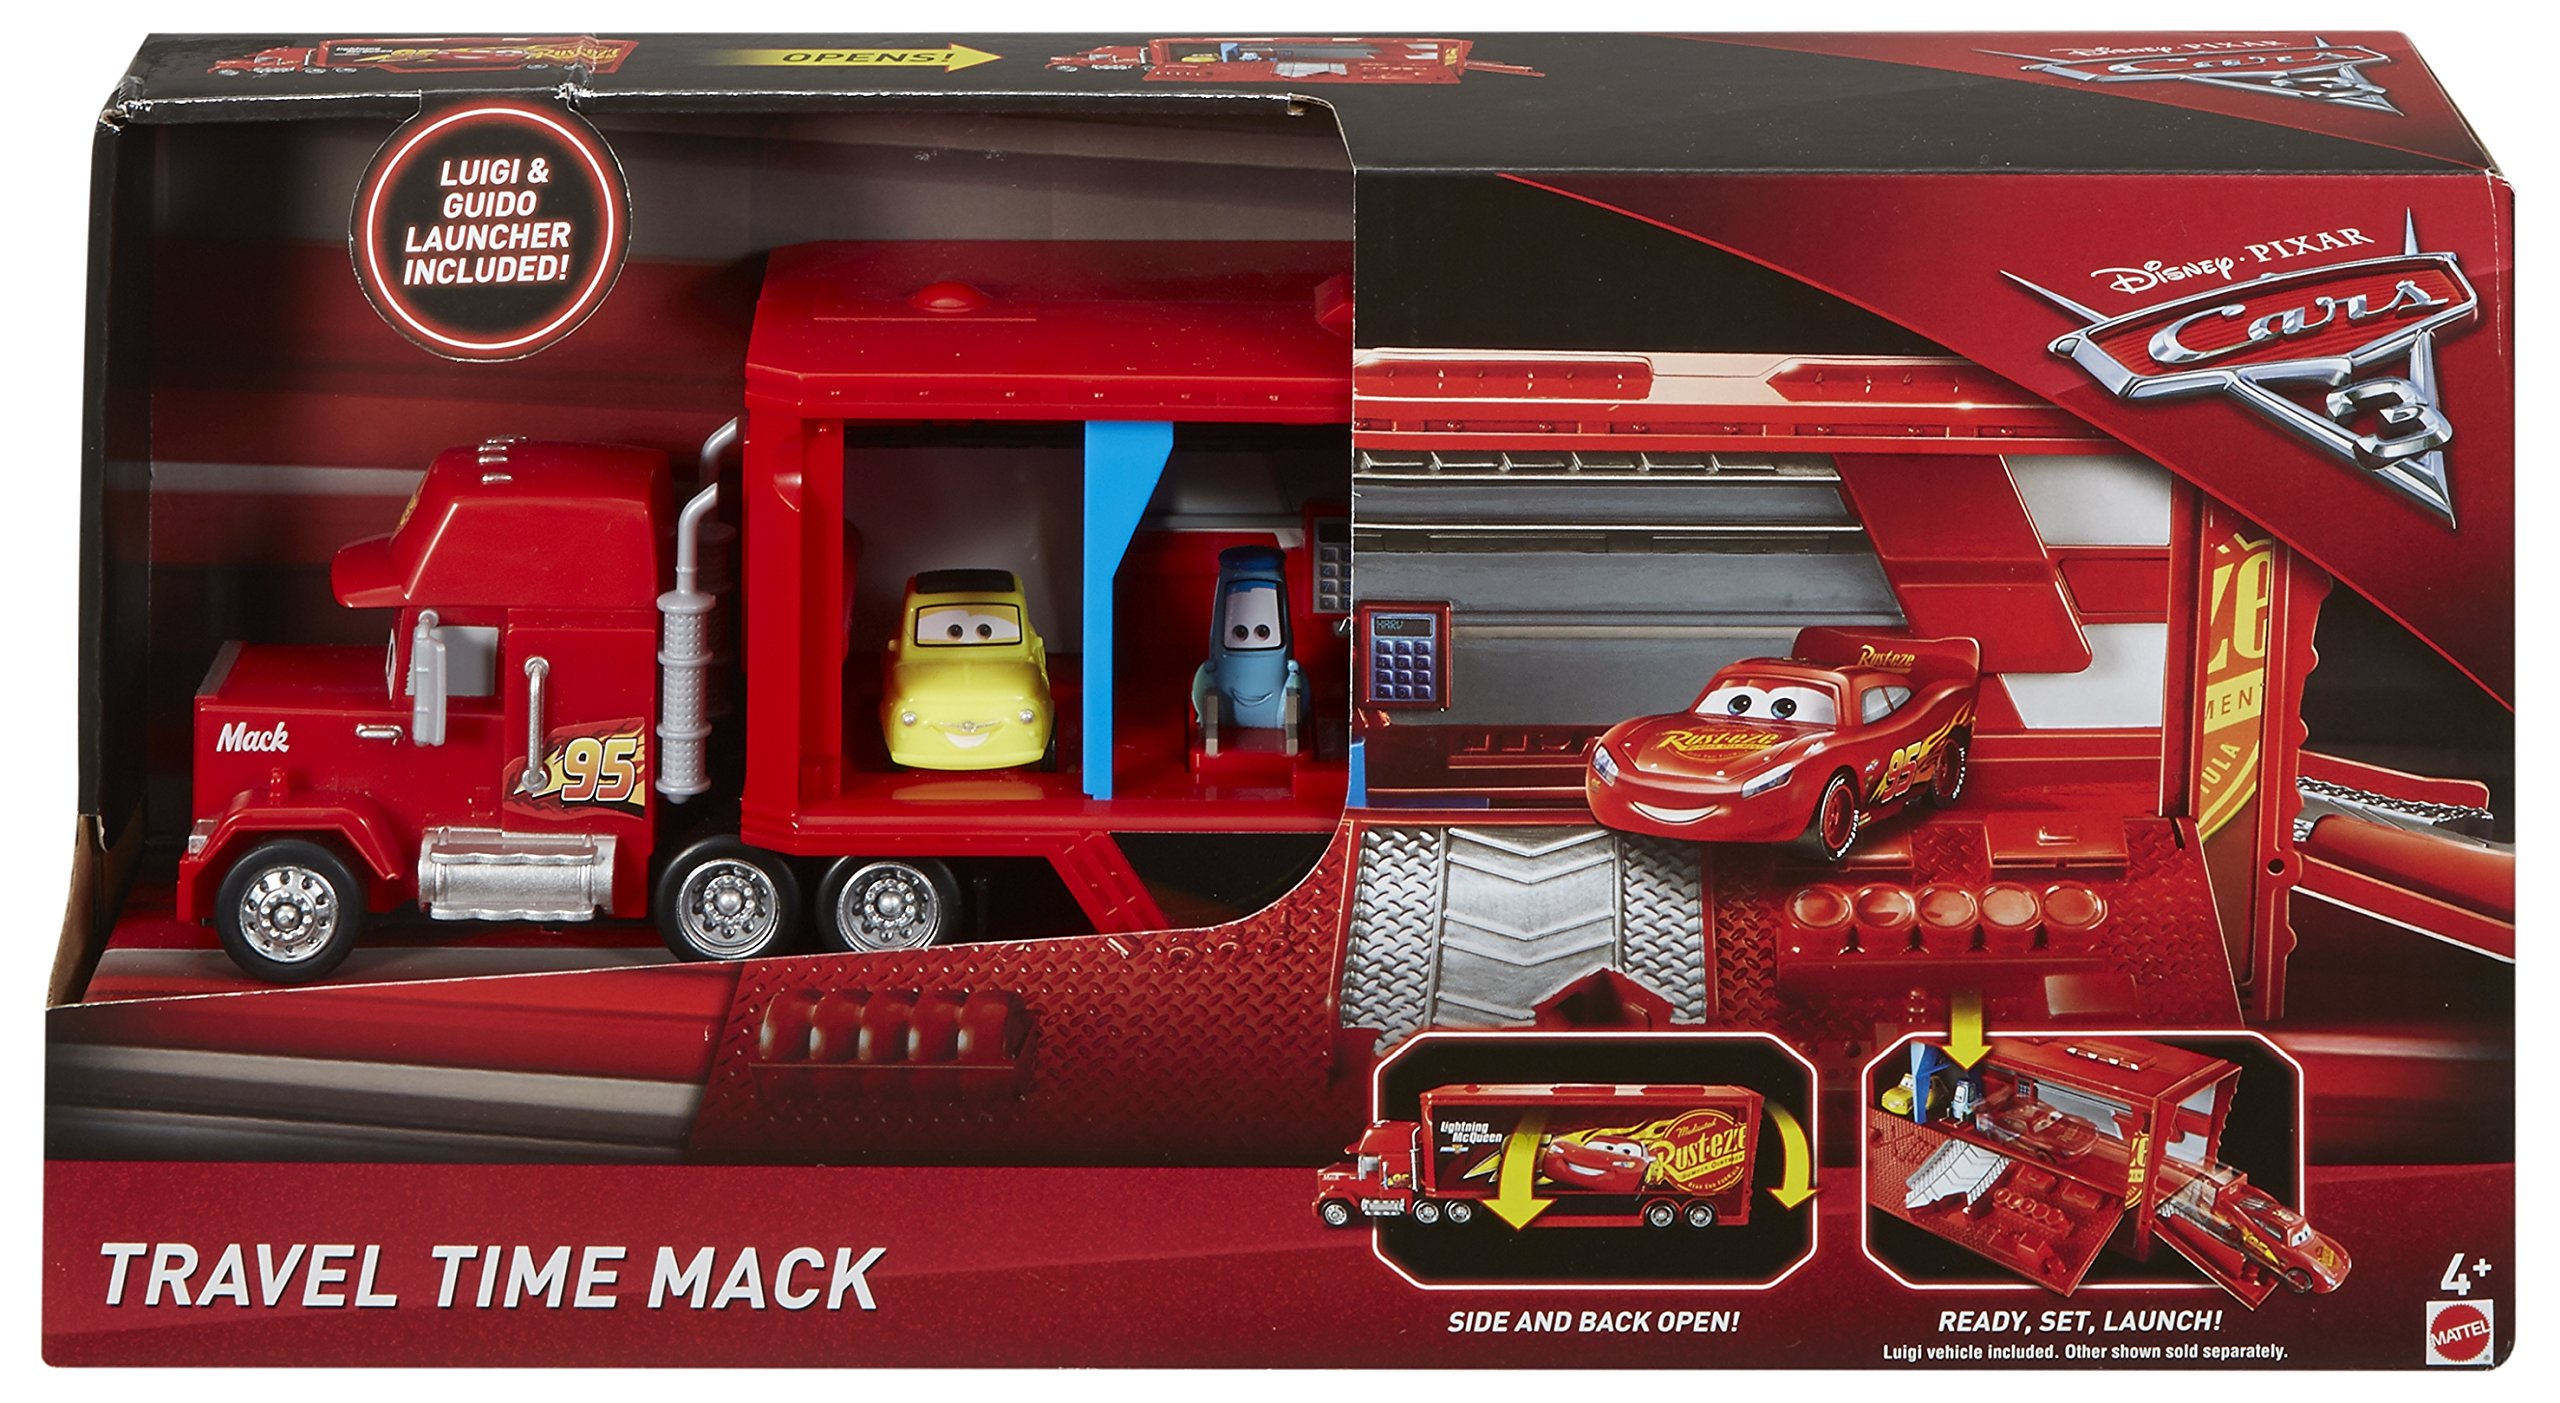 Disney Pixar Cars 3 Travel Time Mack Playset by Disney (Image #8)